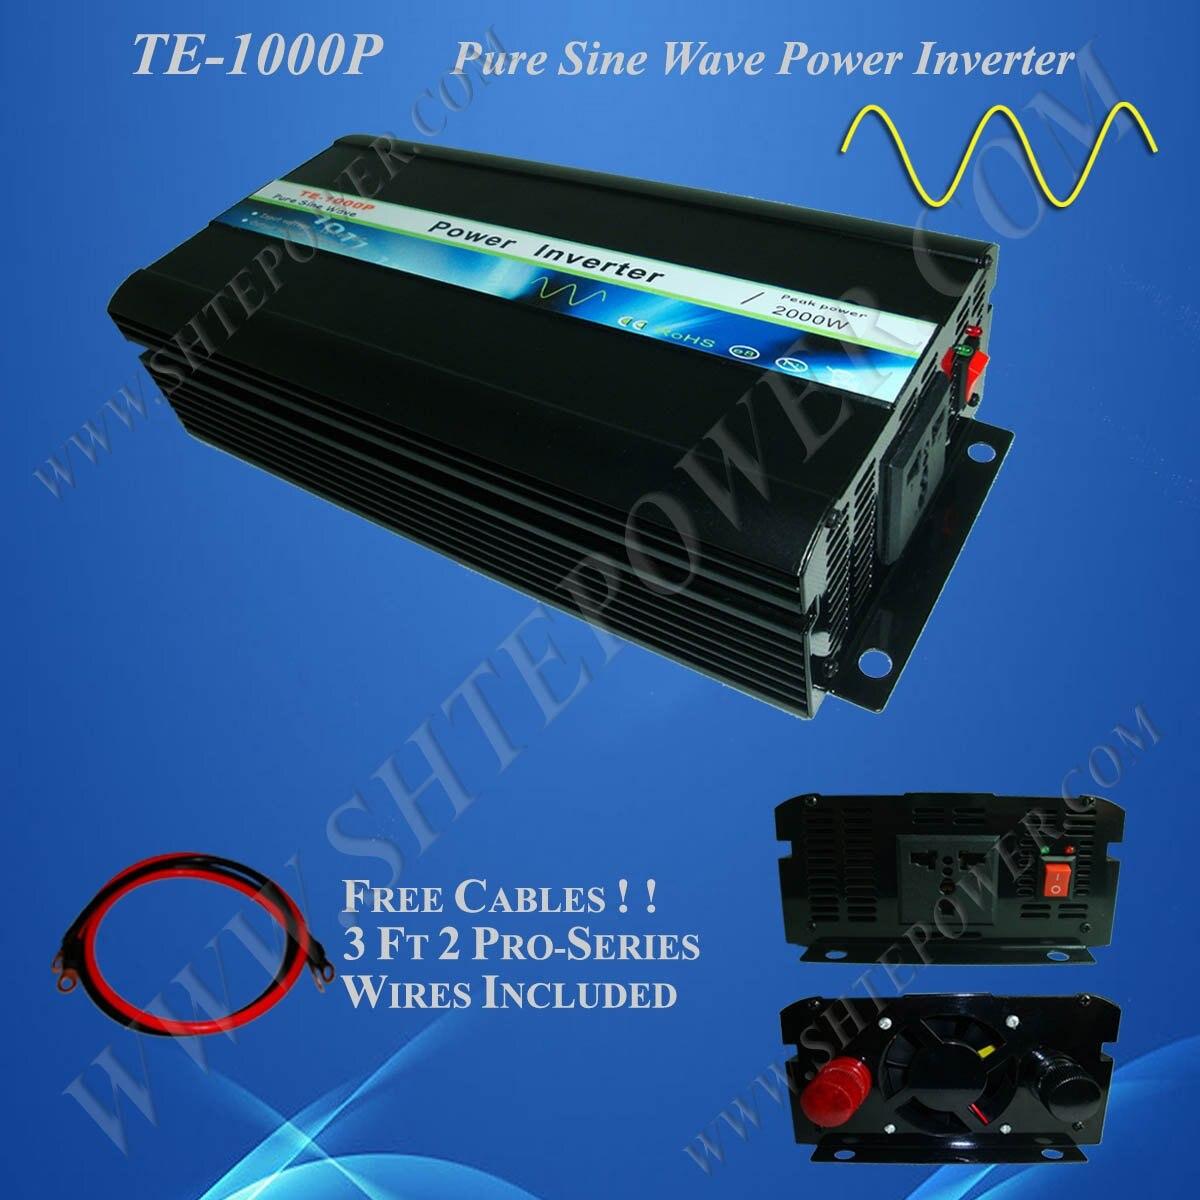 48VDC to 110VAC 1000watts Pure Sine Wave Power Inverter48VDC to 110VAC 1000watts Pure Sine Wave Power Inverter